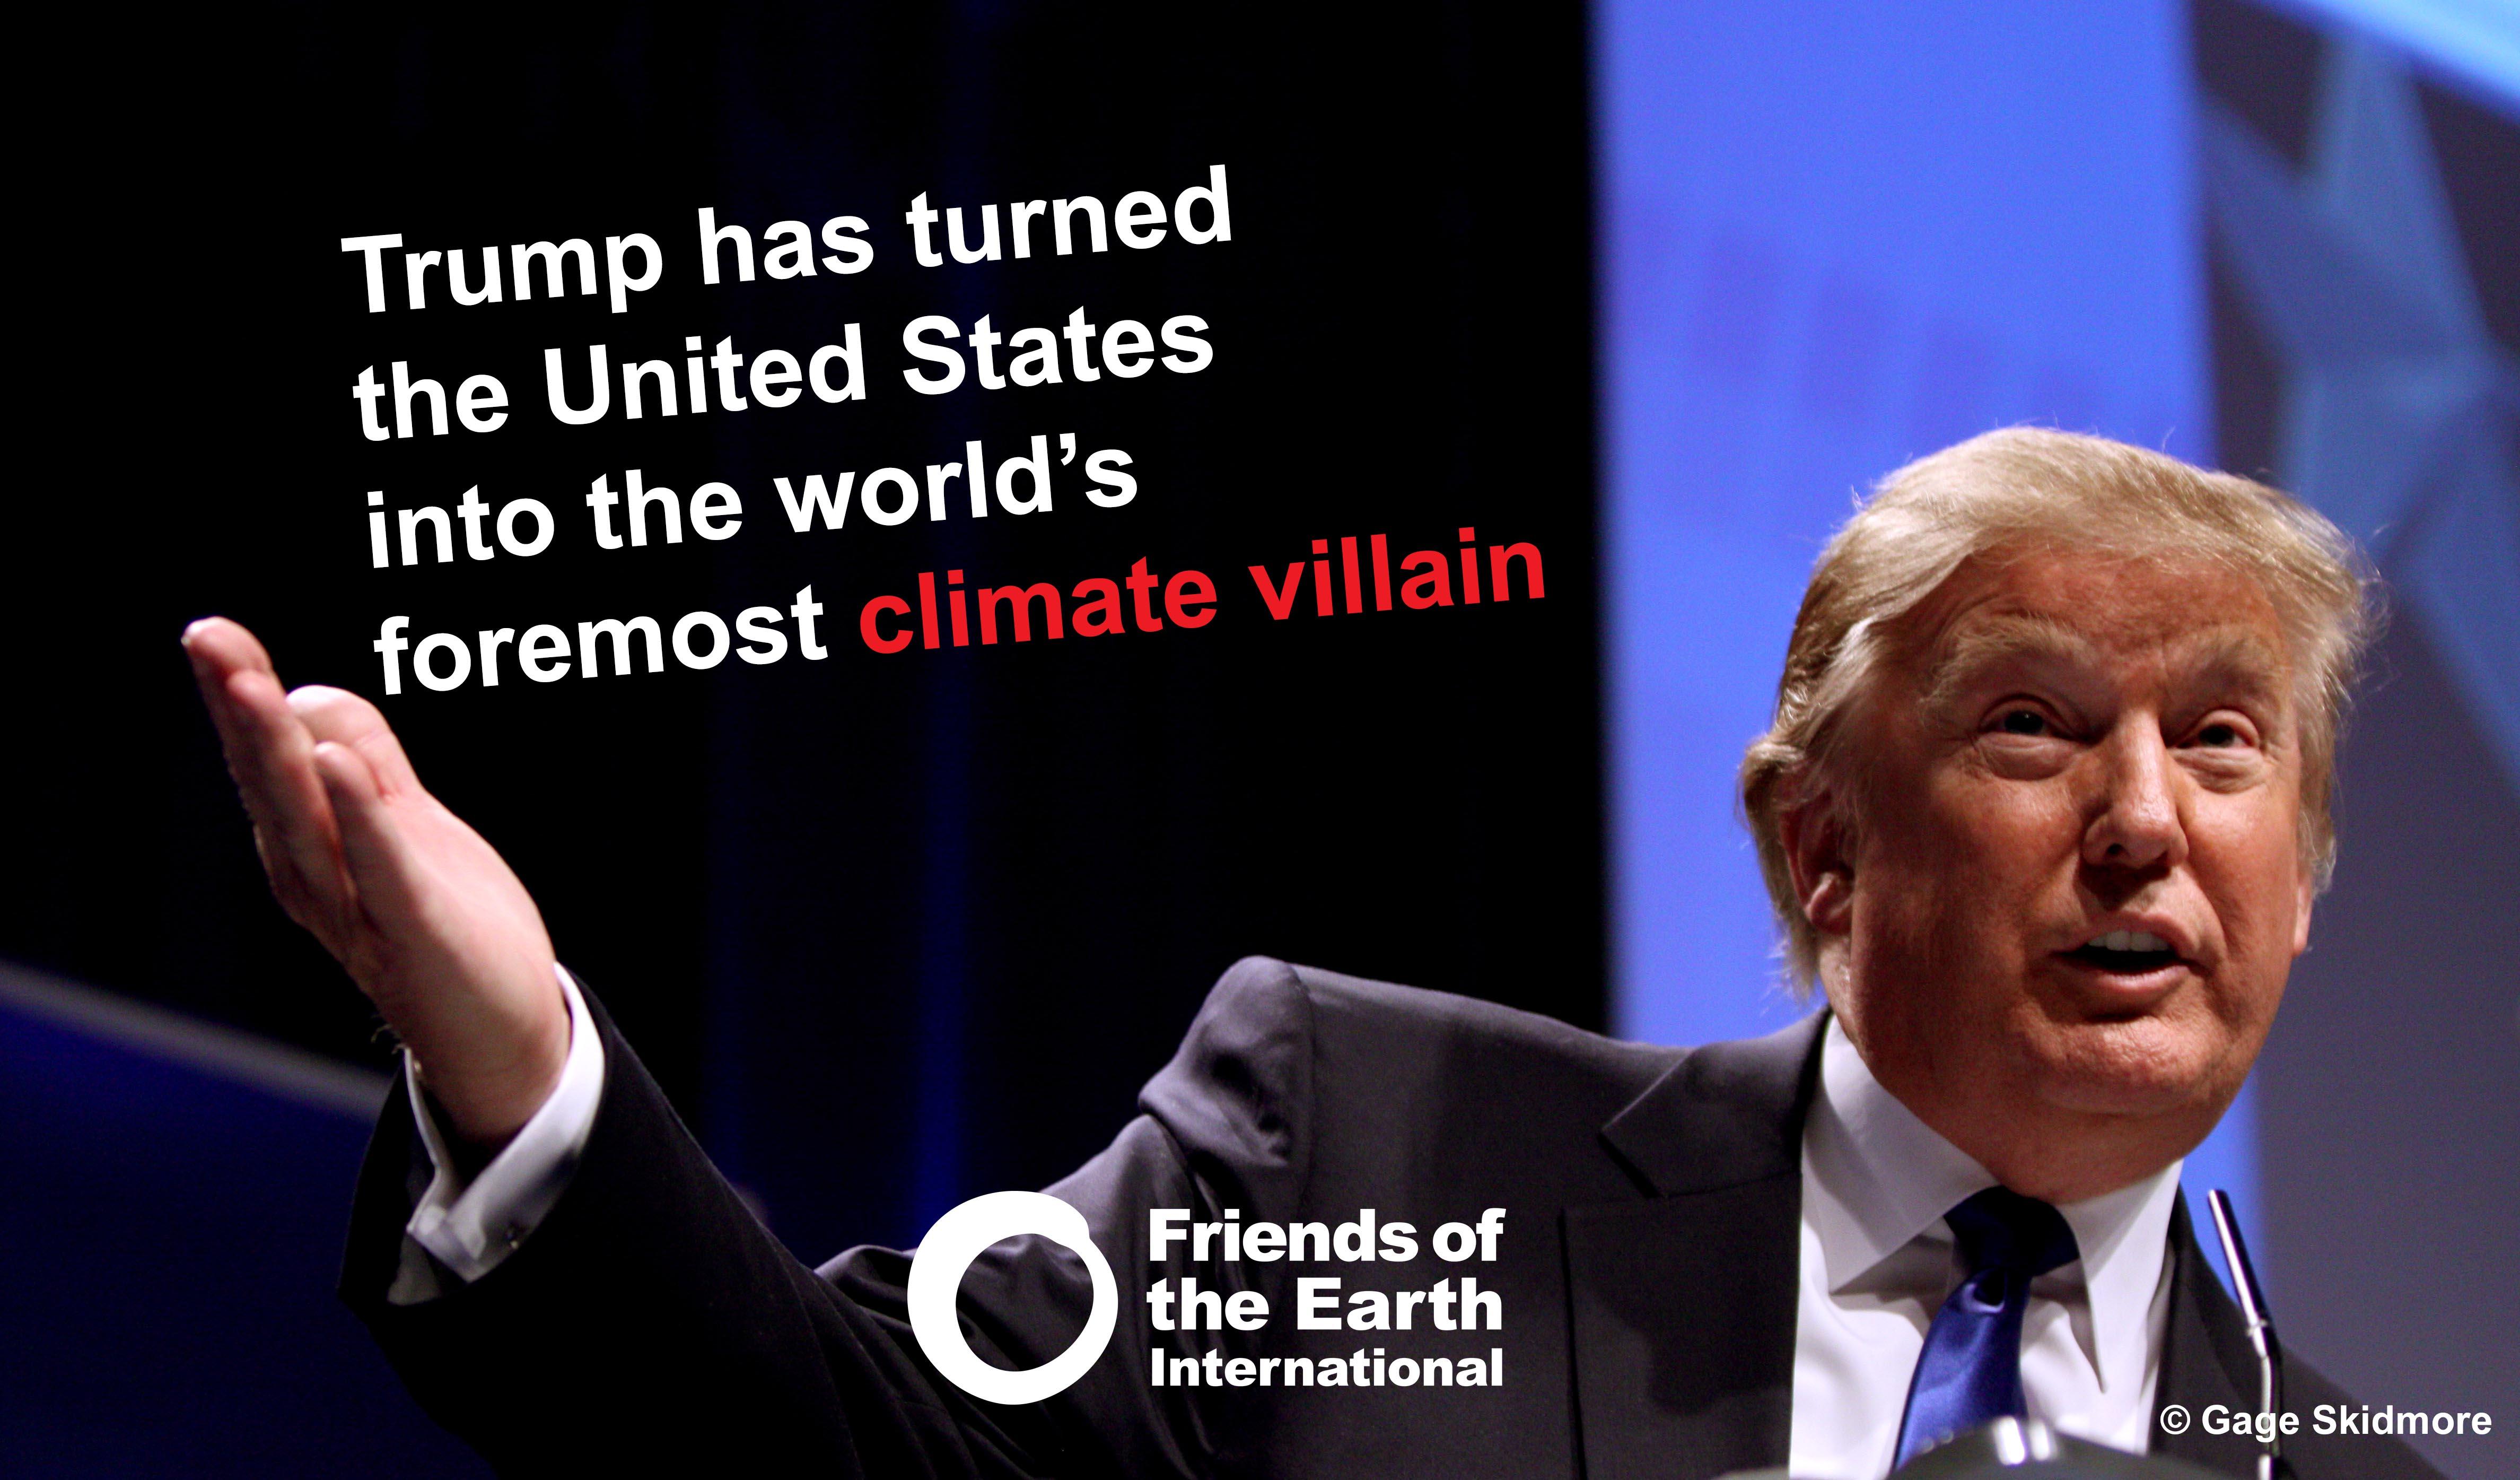 trump_climate_villain.jpg